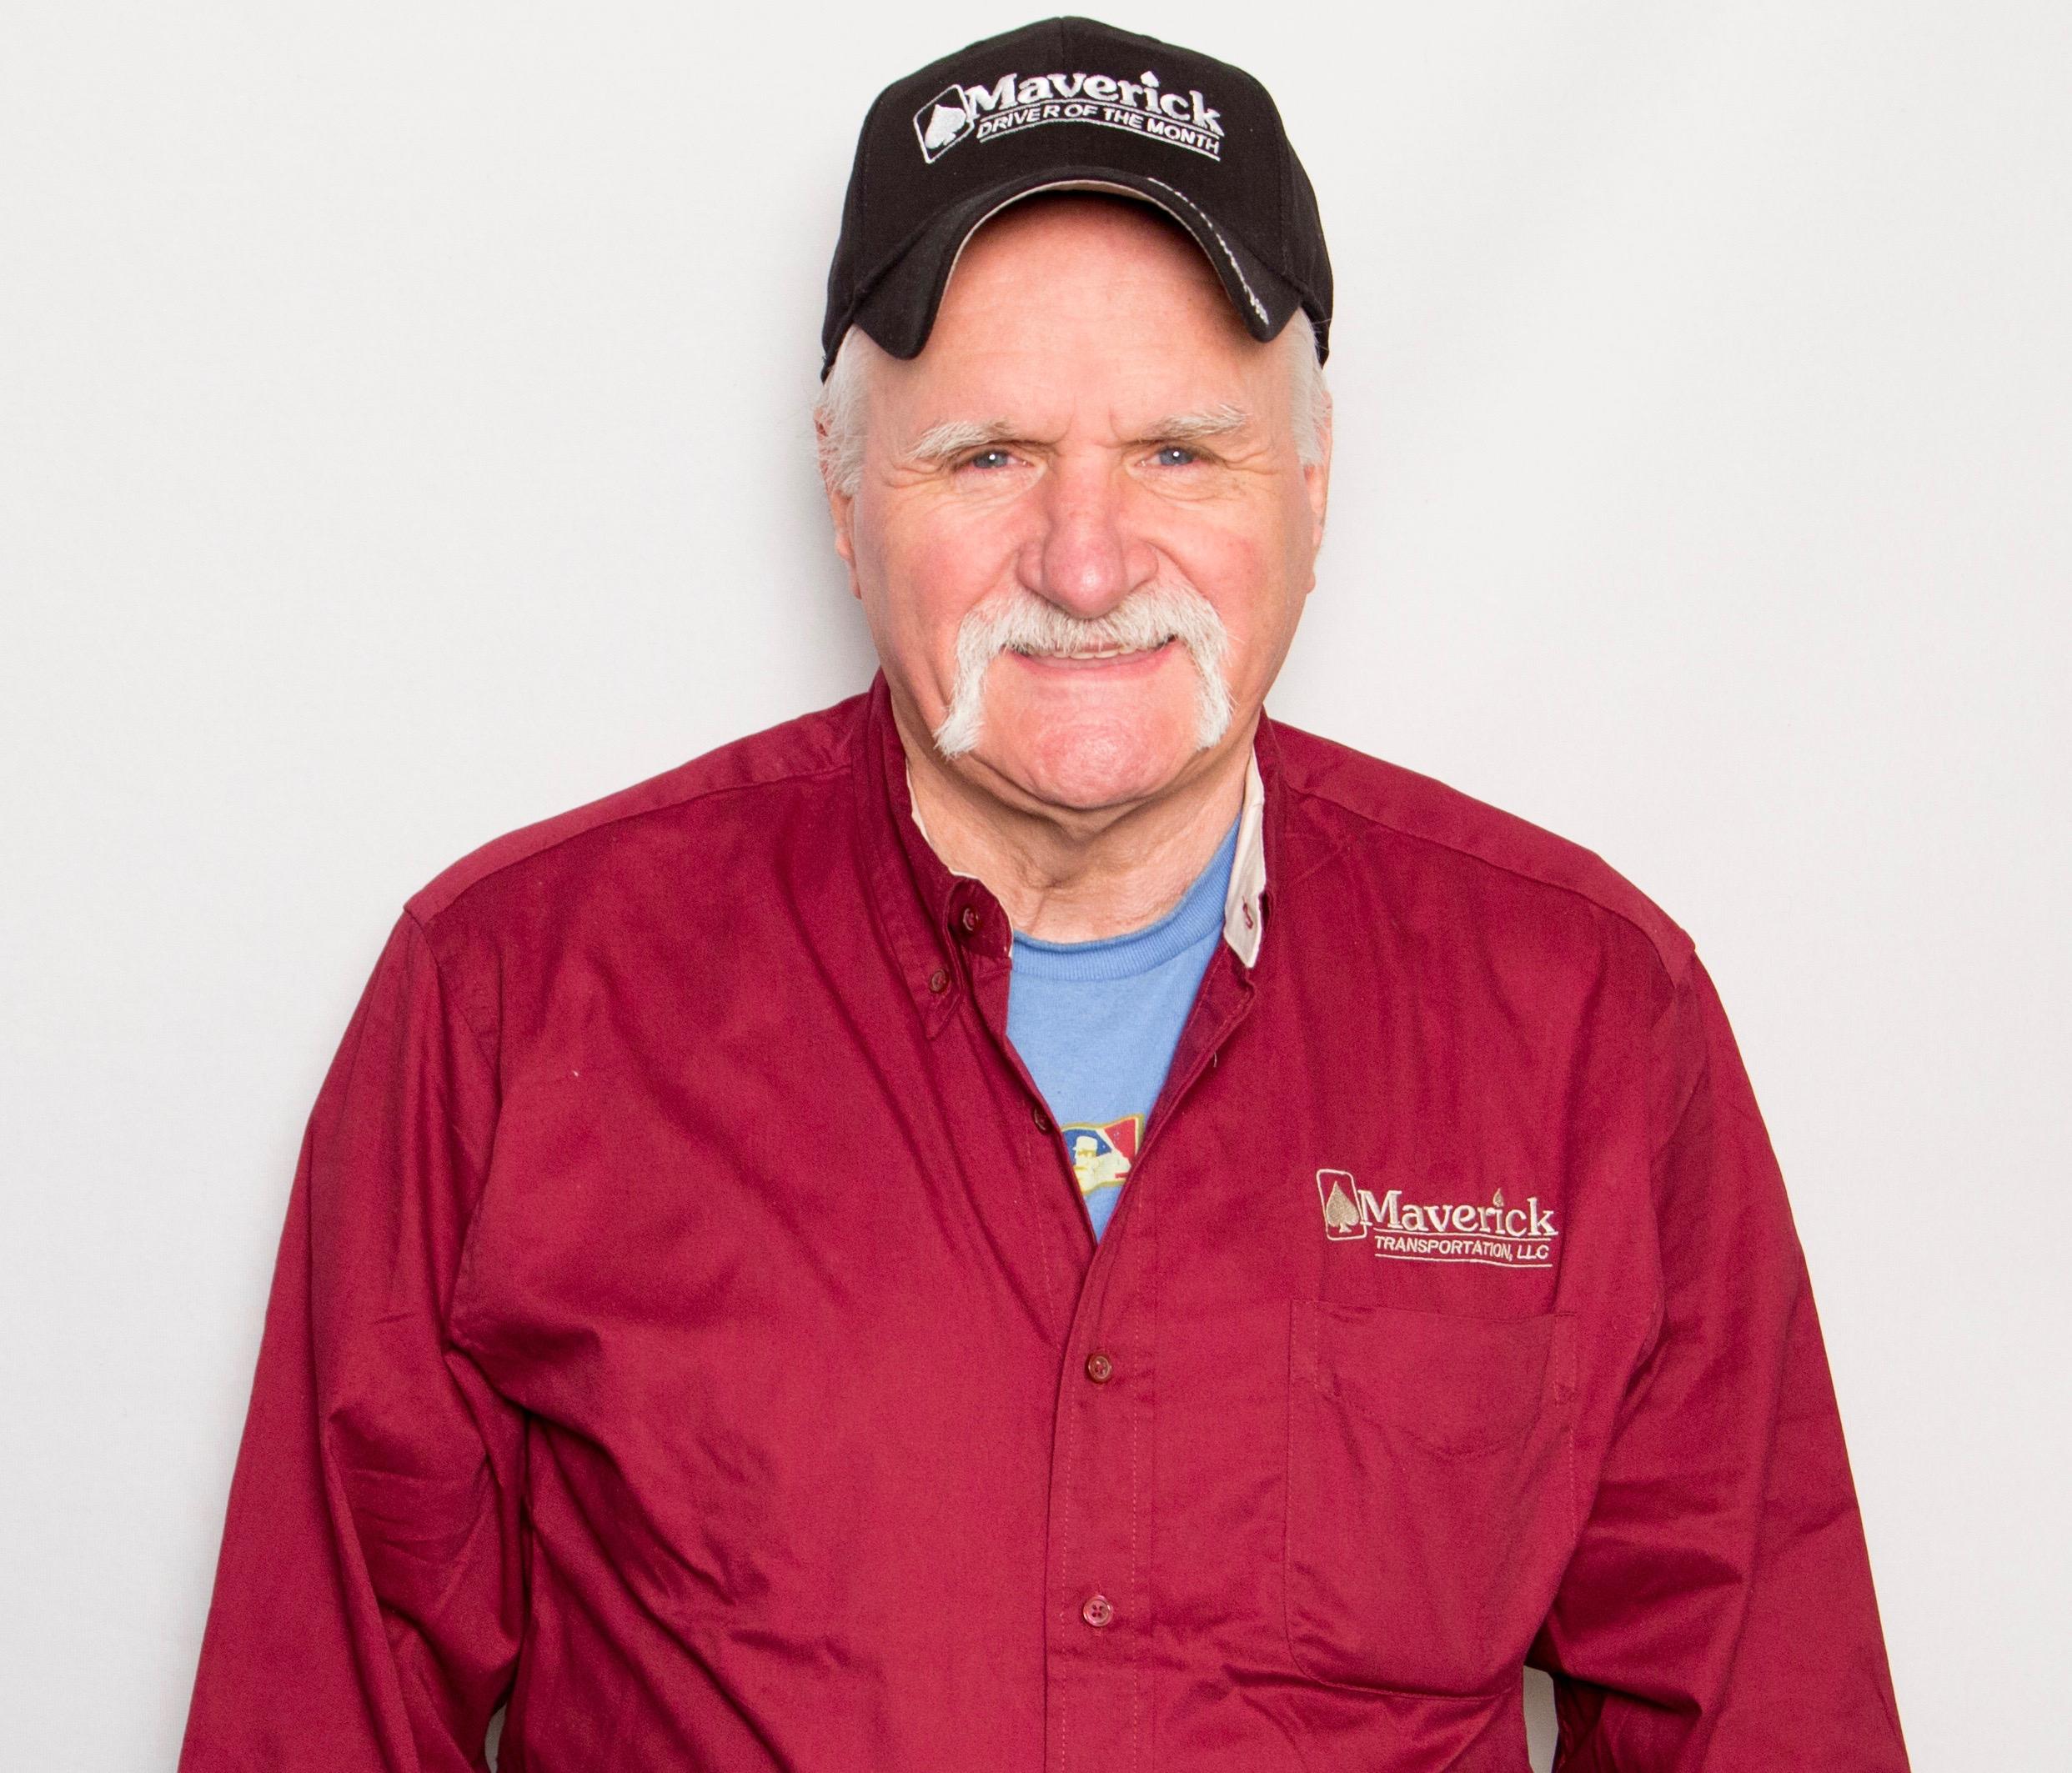 Maverick Driver and U.S. Army veteran Roger Wyble